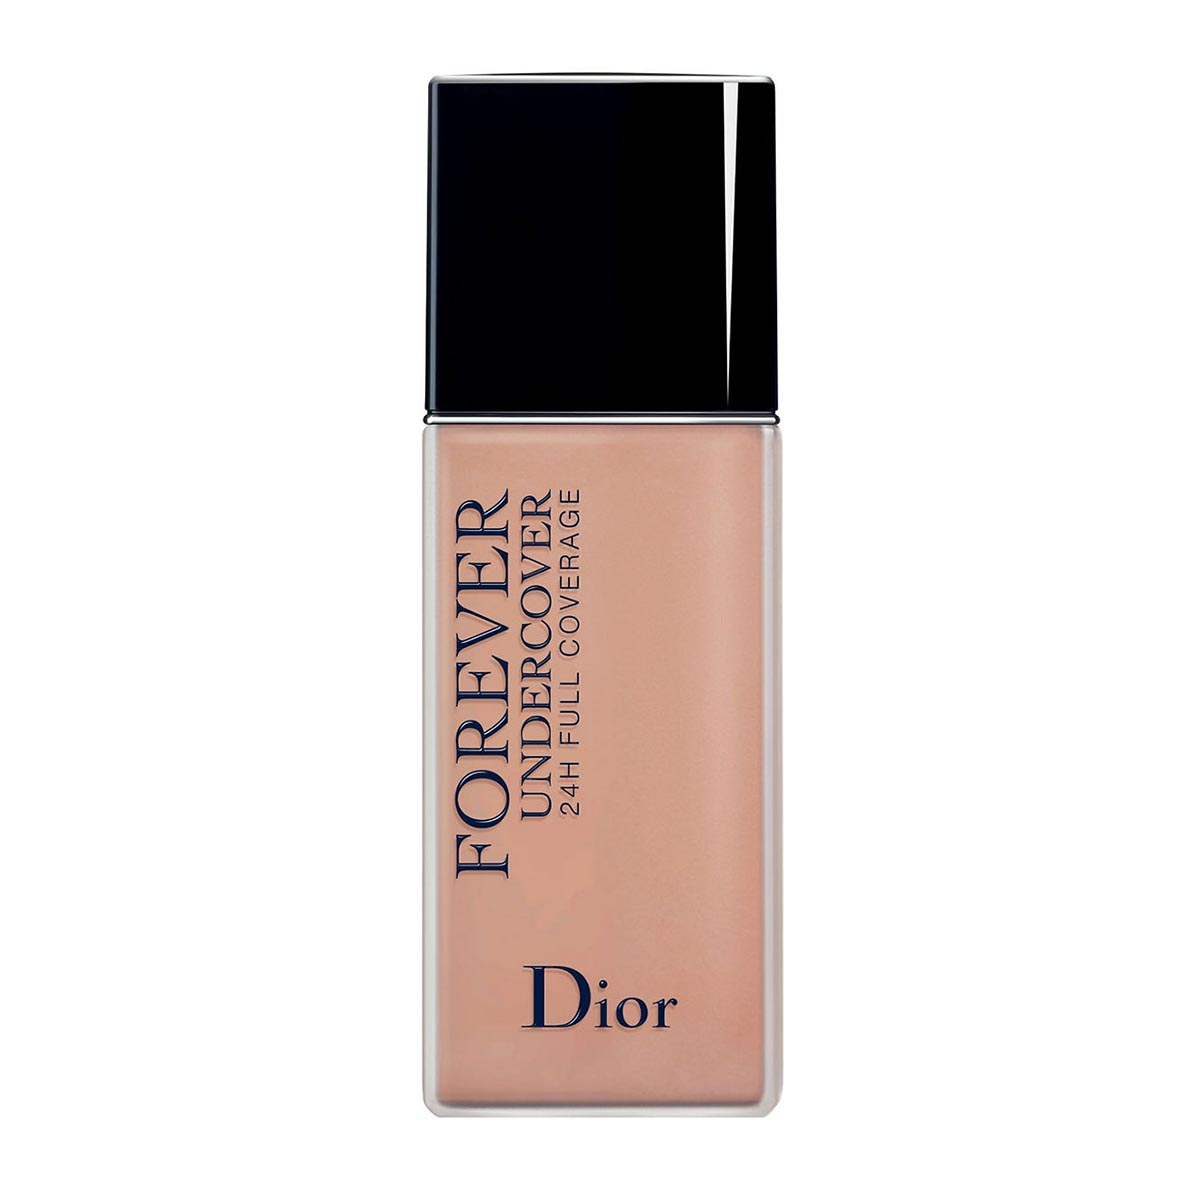 Dior diorskin forever undercover fond de teint 035